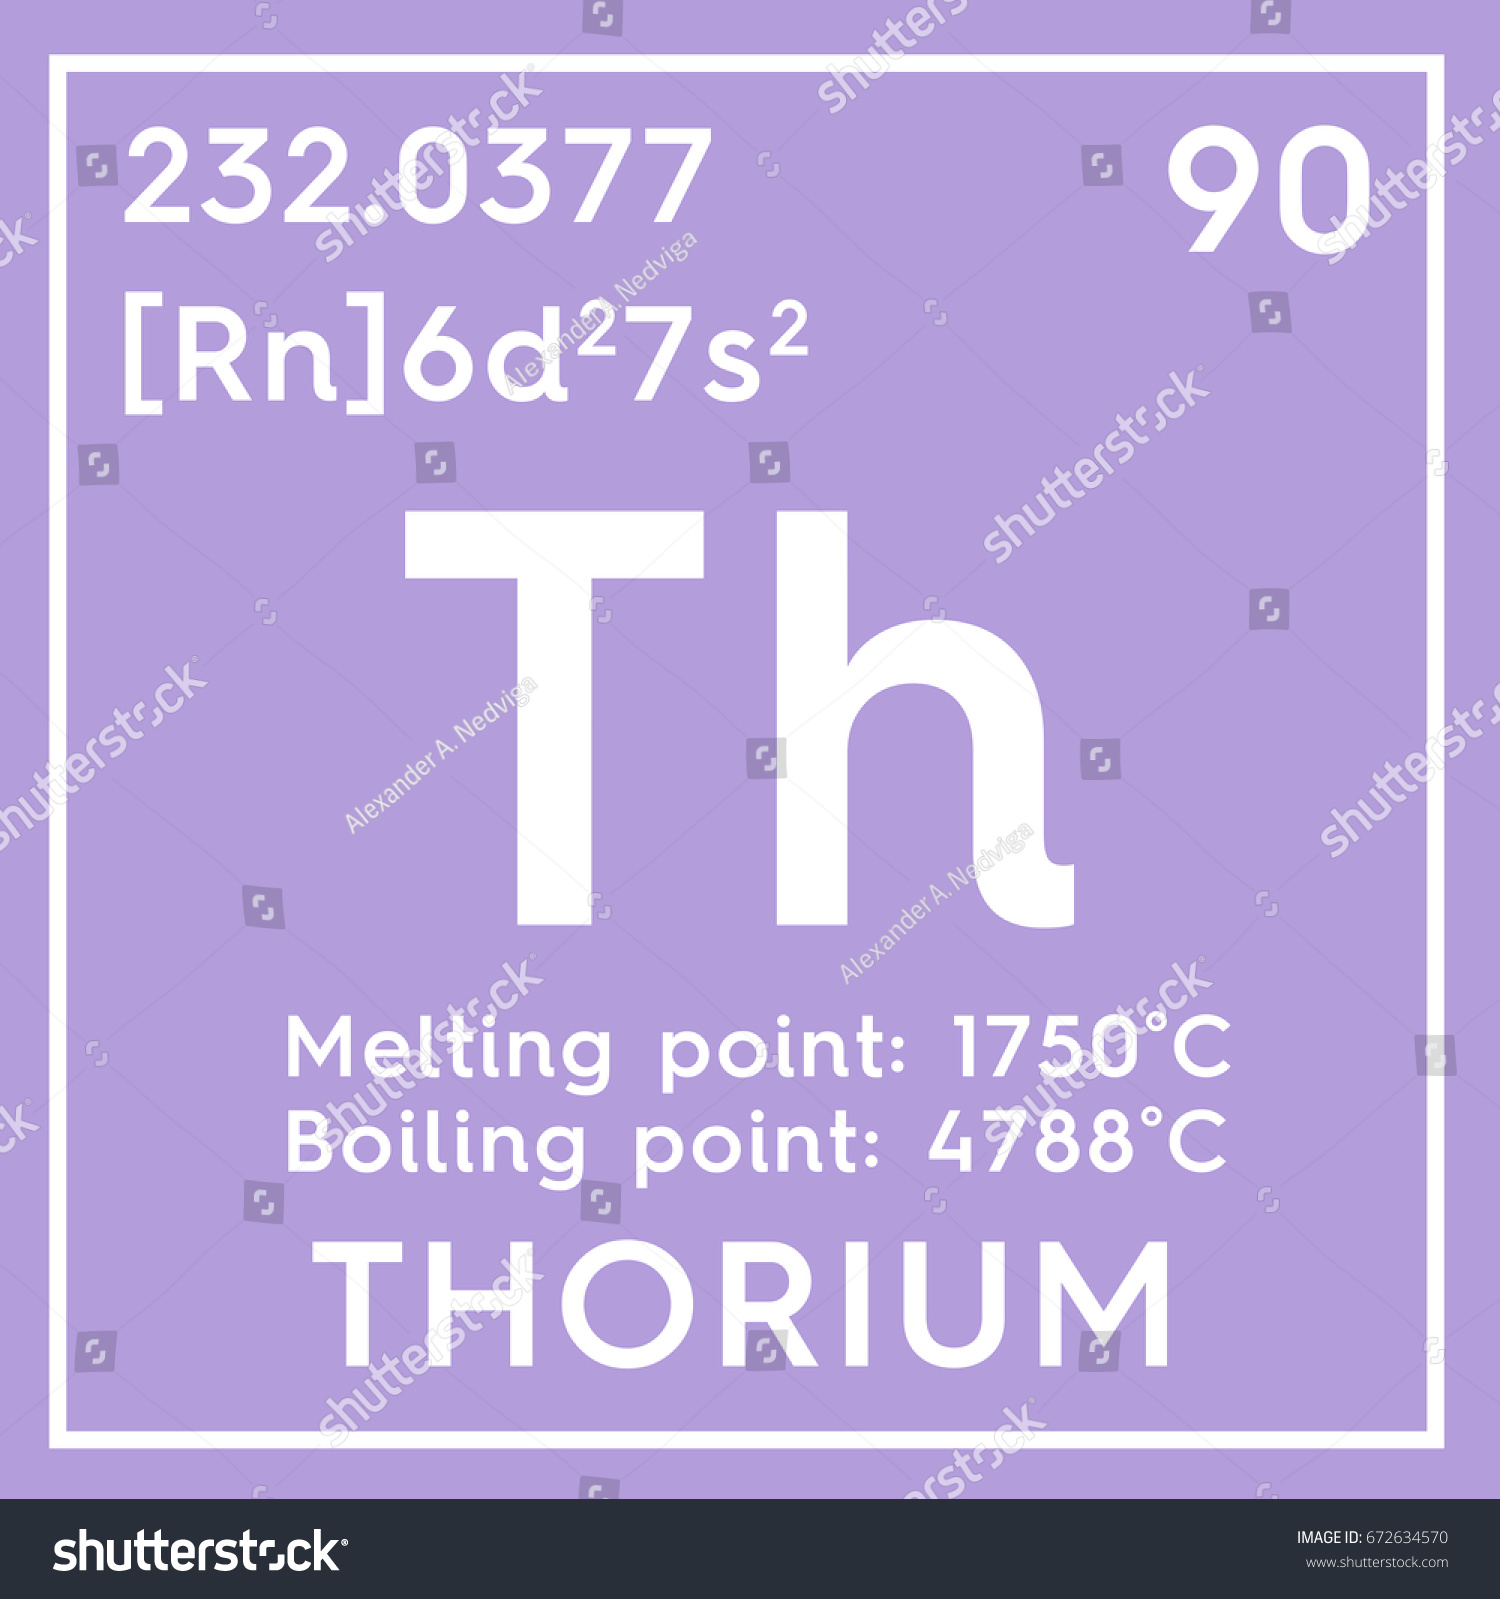 Thorium actinoids chemical element mendeleevs periodic stock chemical element of mendeleevs periodic table thorium in square cube creative gamestrikefo Image collections